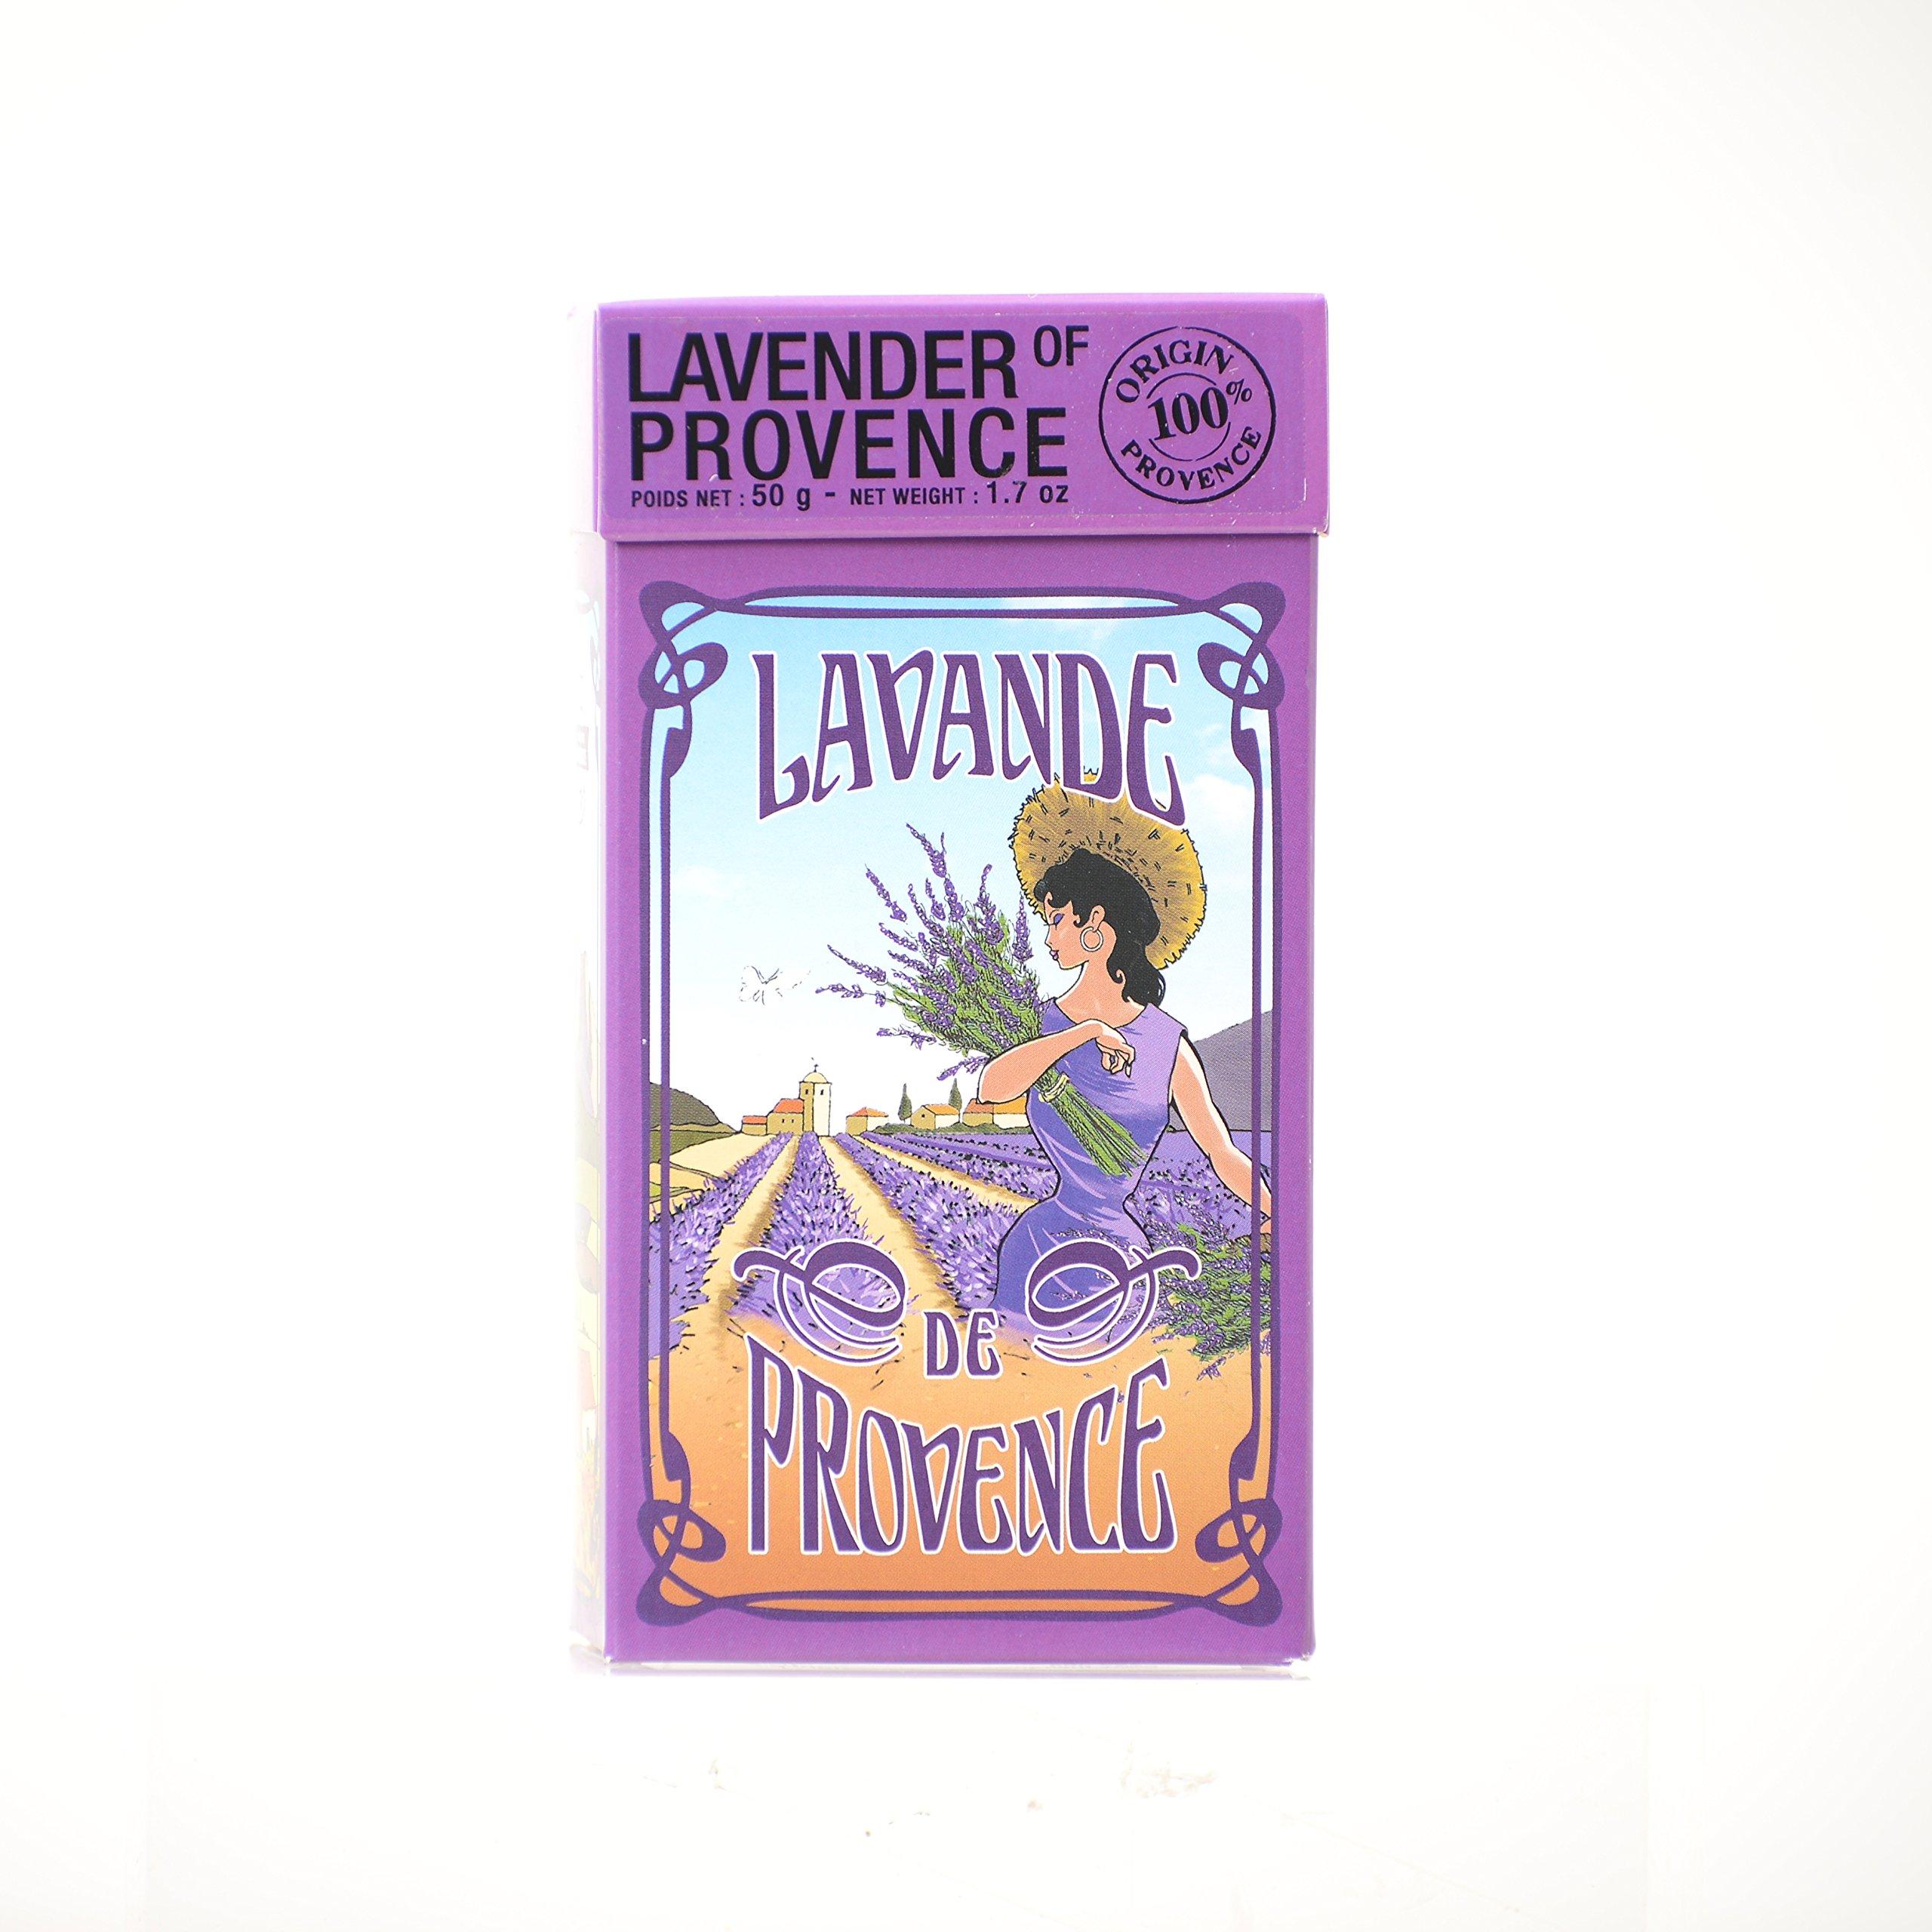 L'Ami Provencal Lavender Flowers in GIft Box - 1.7 oz